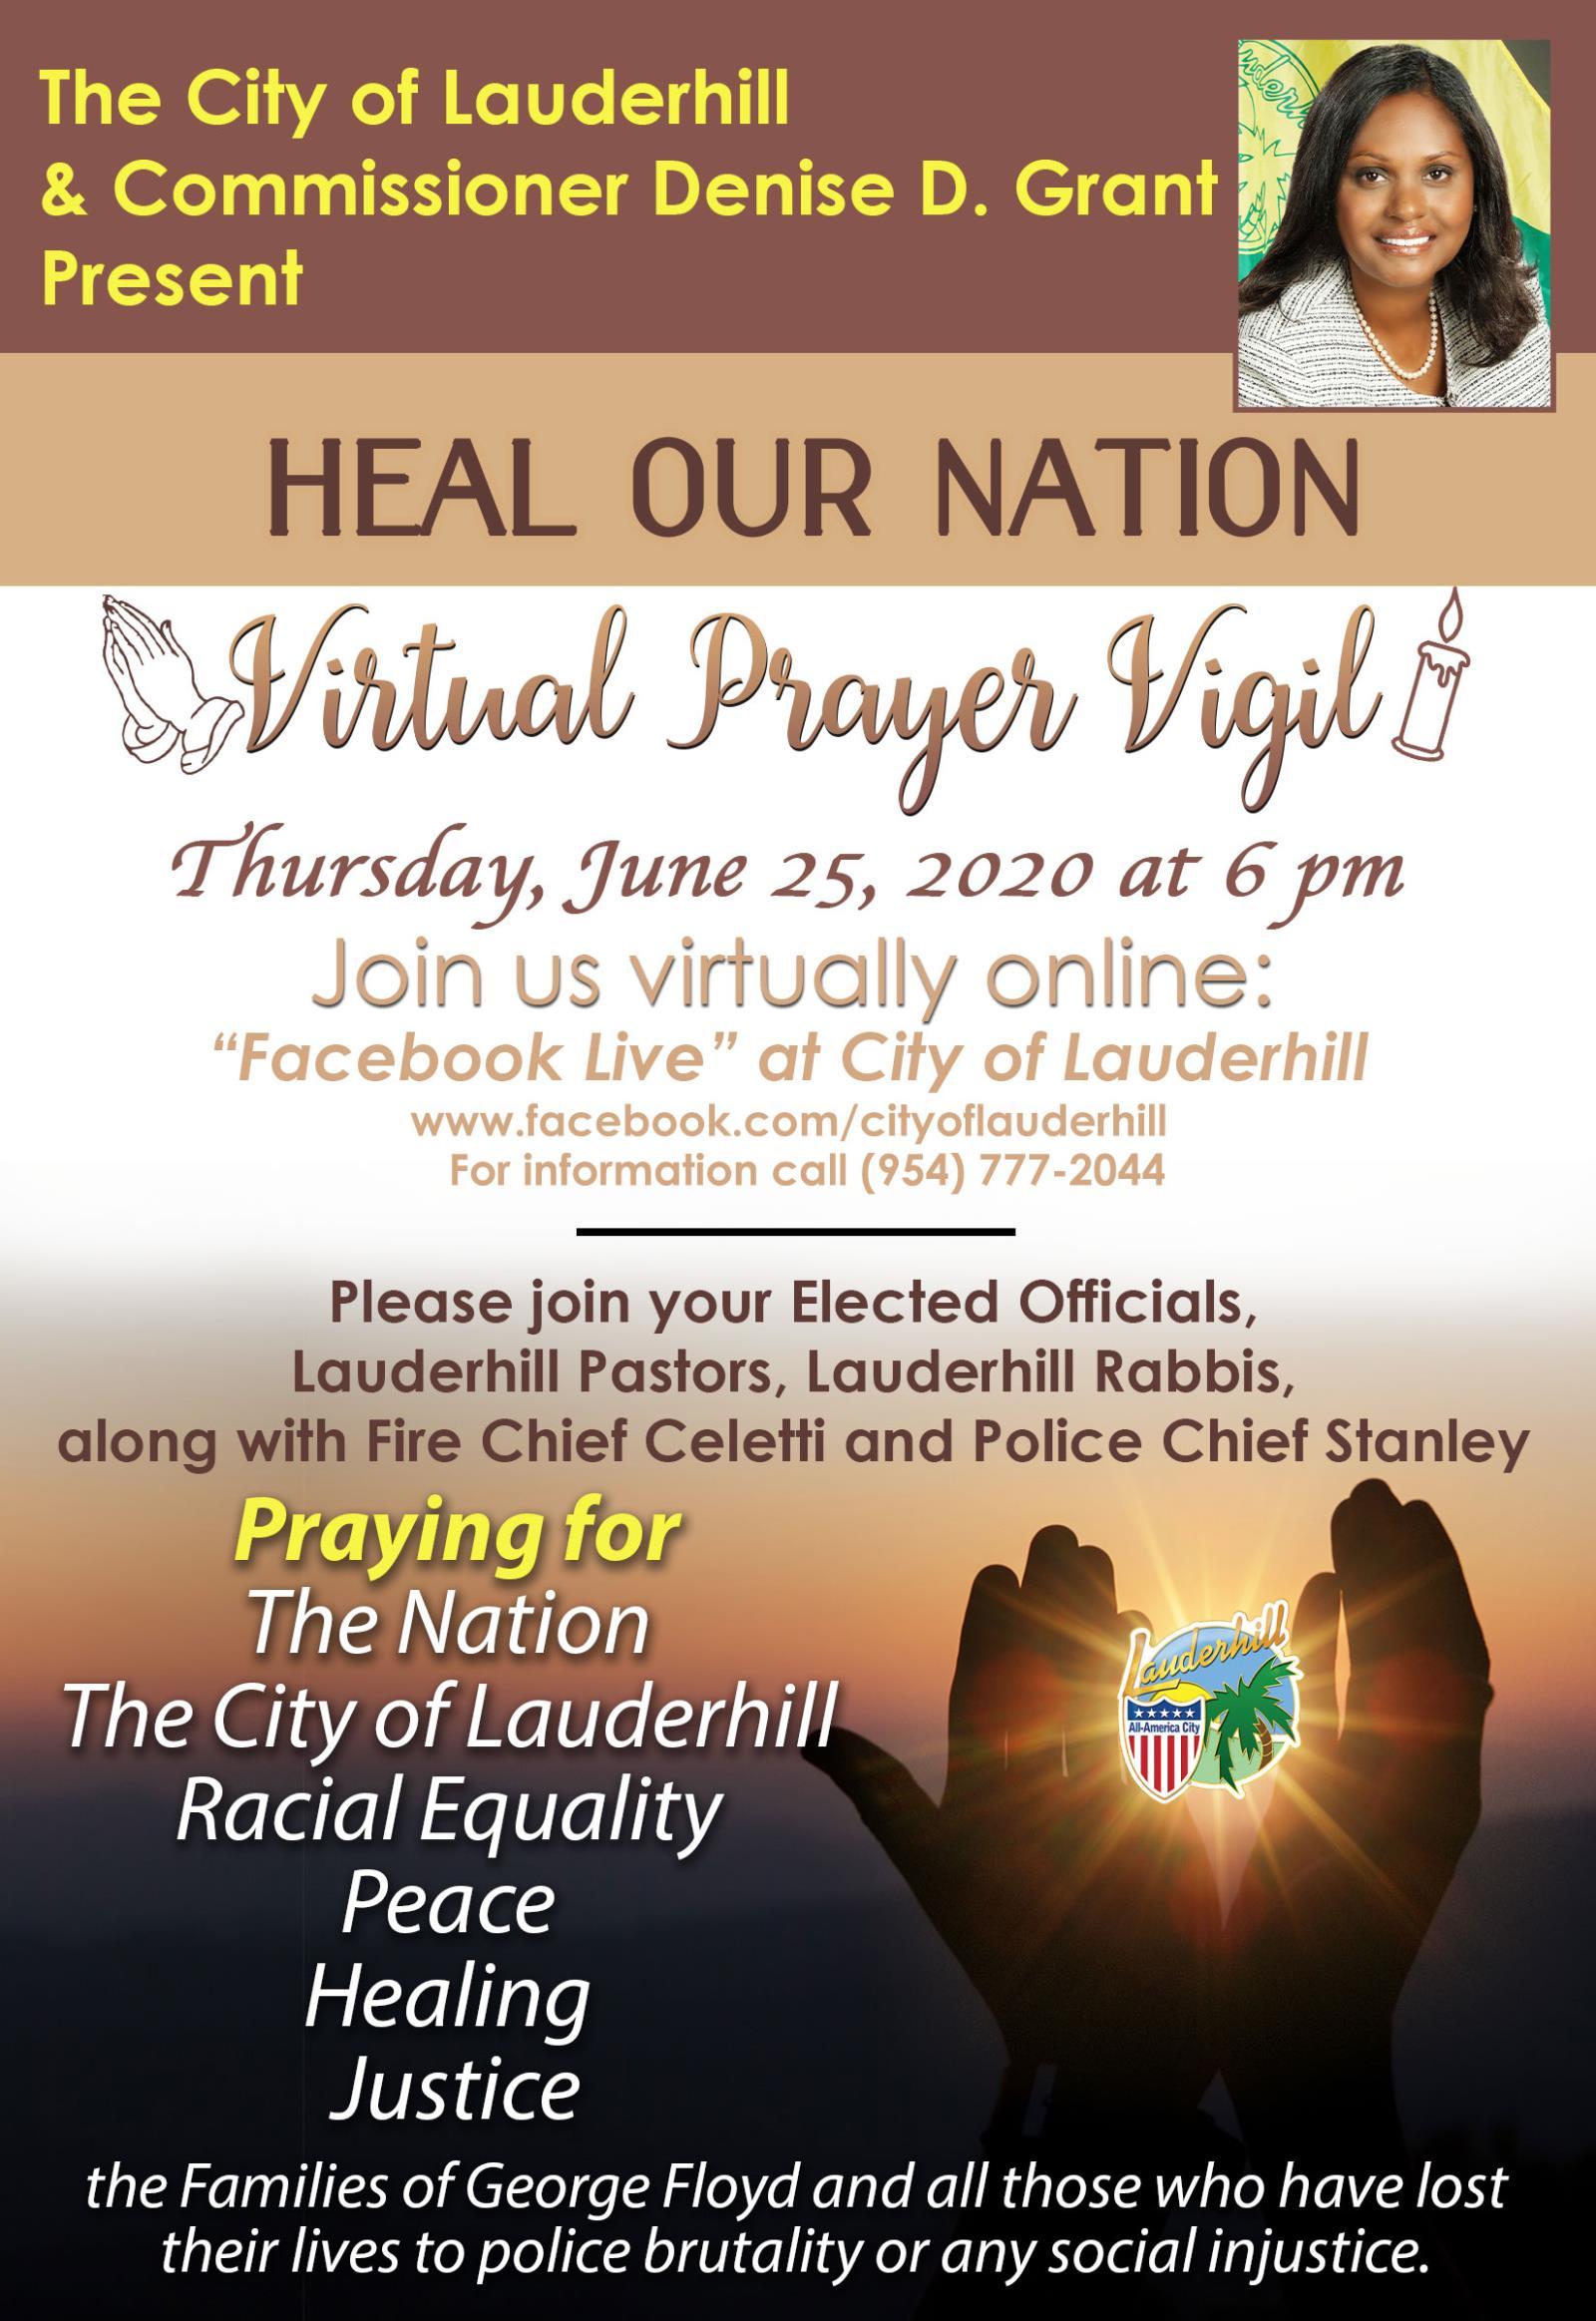 6-25-20 - Heal Our Nation Virtual Prayer Vigil - Flyer